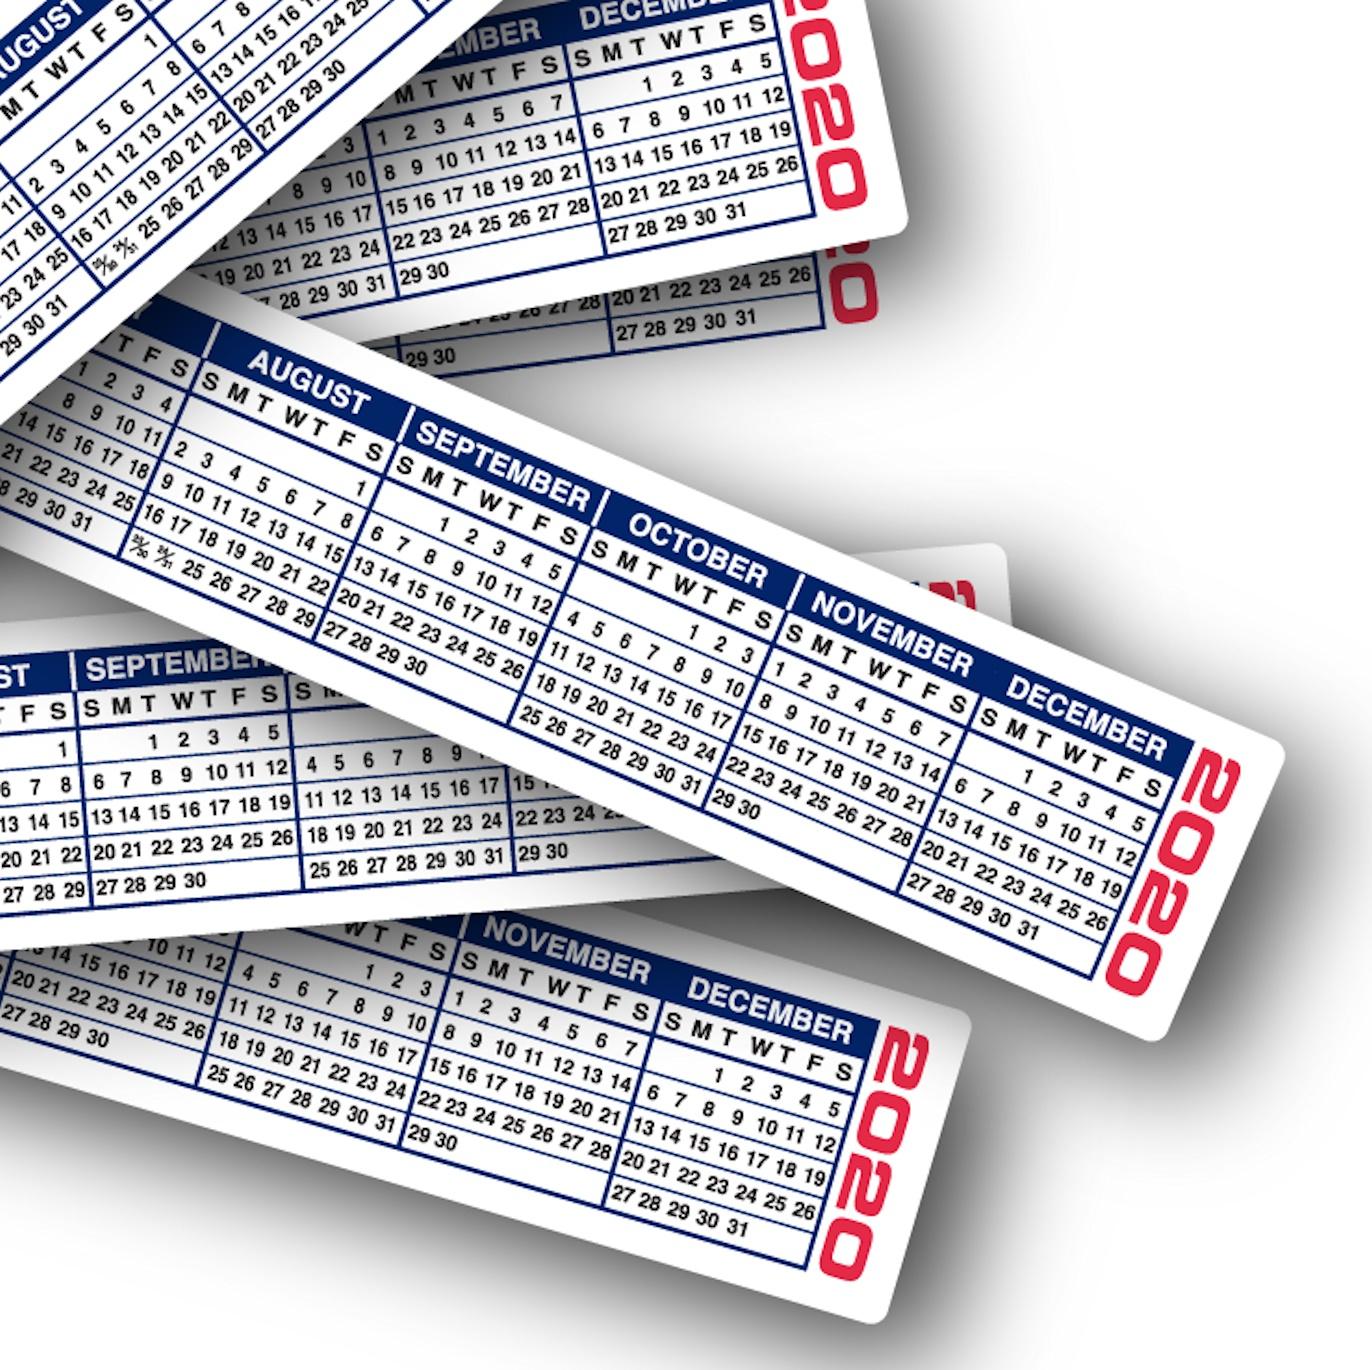 2020 Calendar Strips | Keyboard & Monitor Calendar Strips intended for Keyboard Calendar Strips 2020